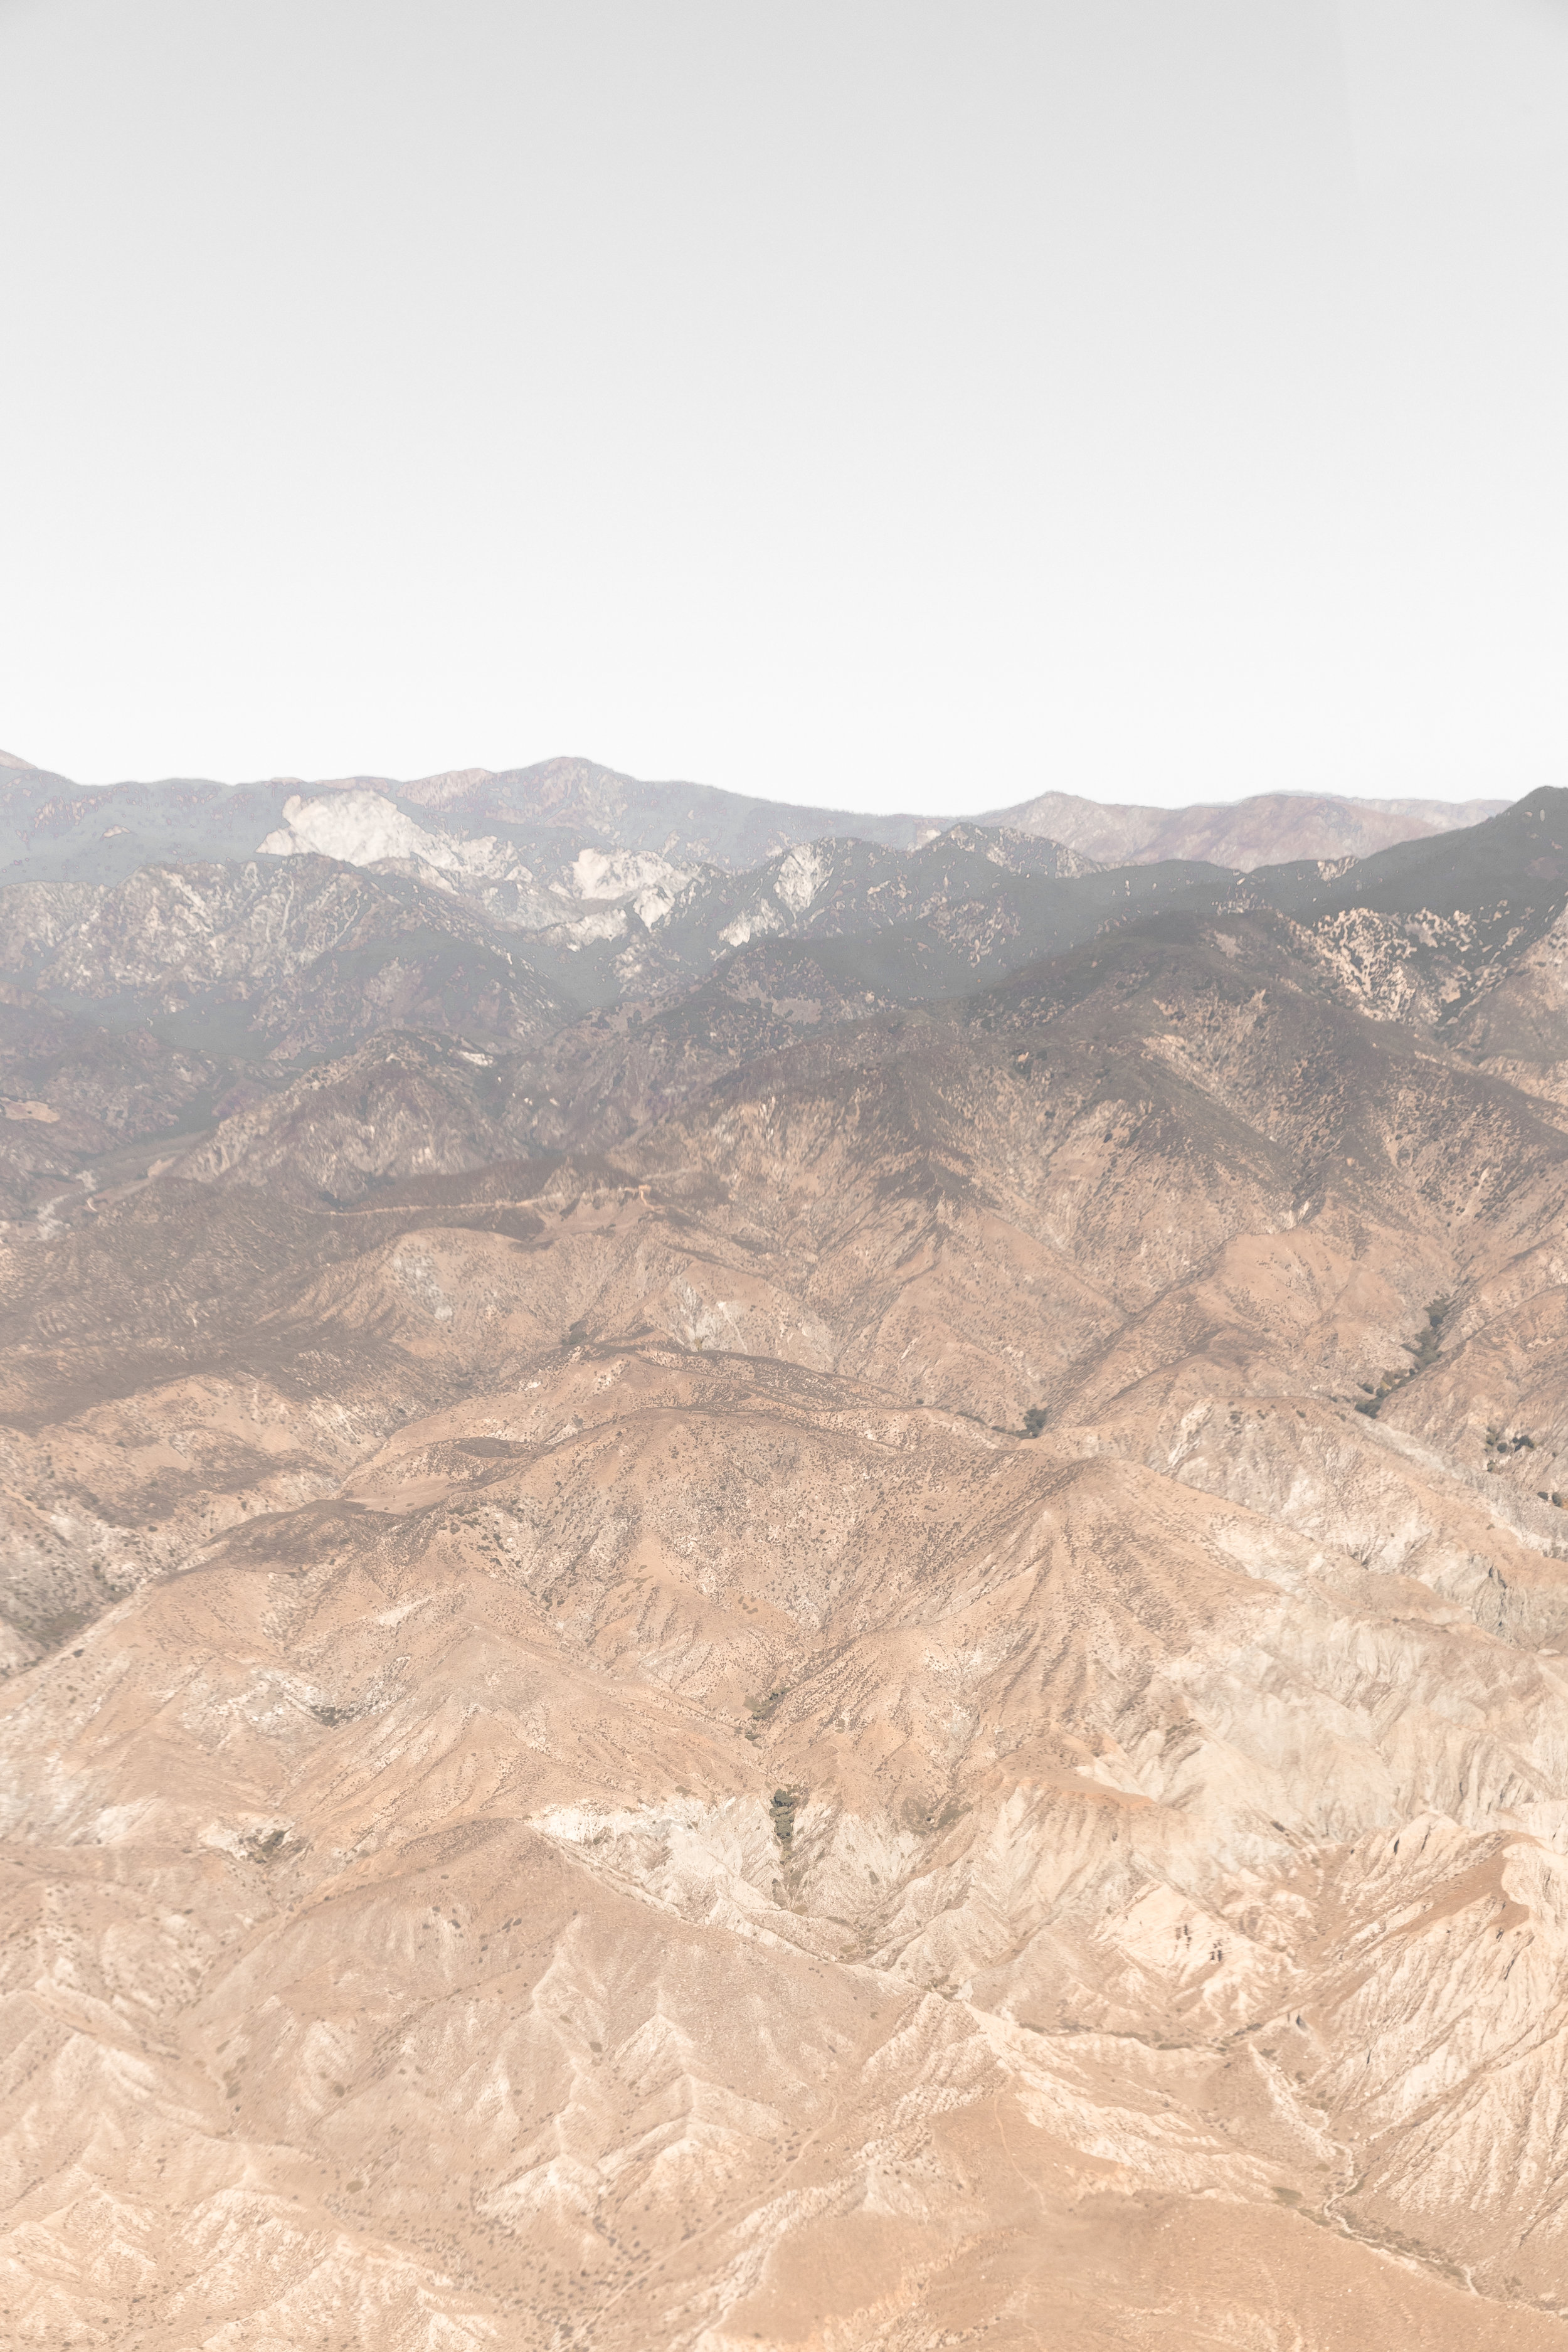 ABE1_IEX_Landscapes-7.jpg